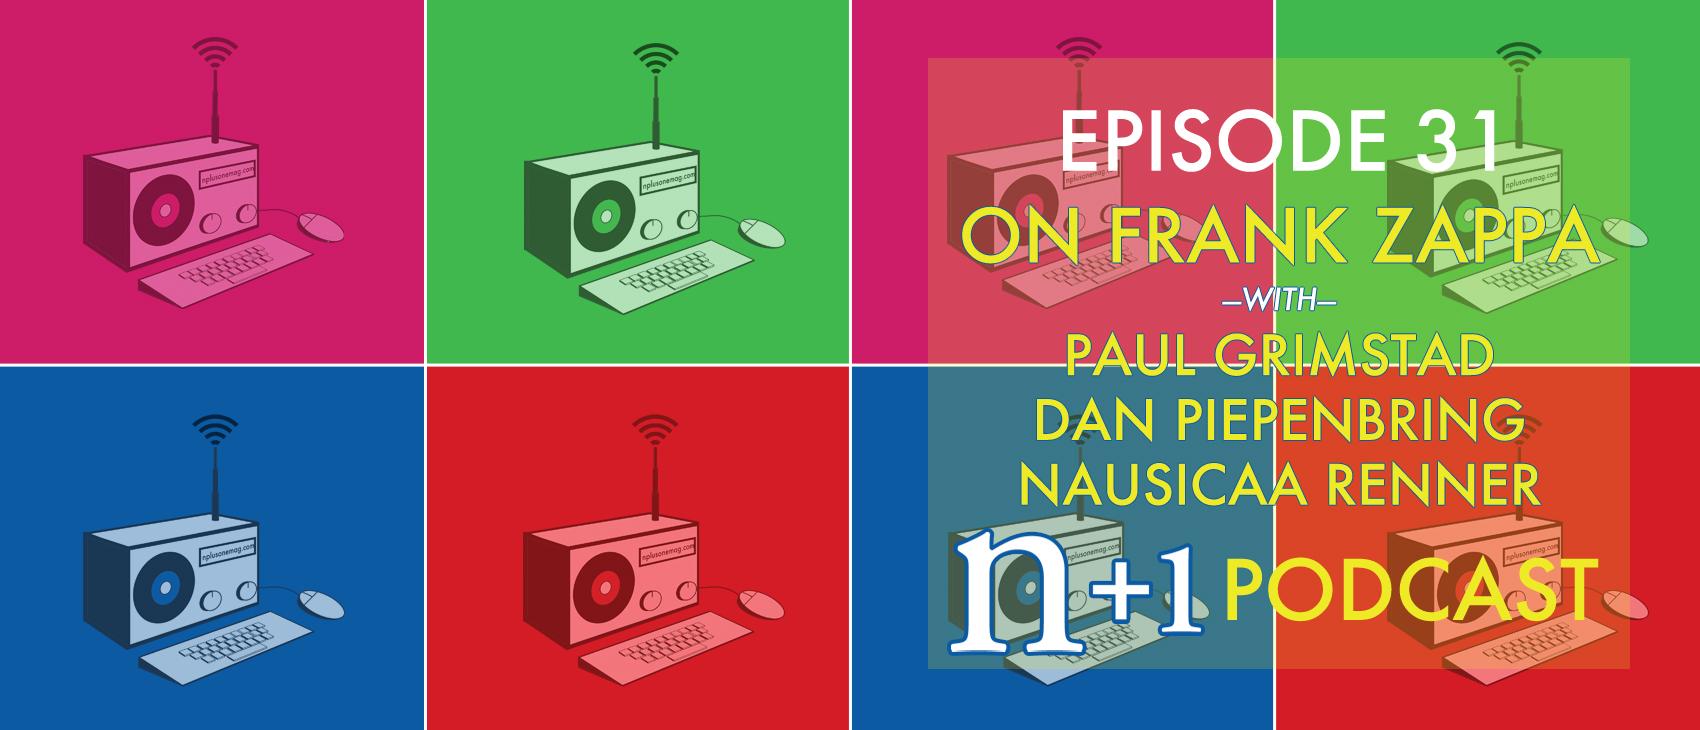 Episode 31: On Frank Zappa